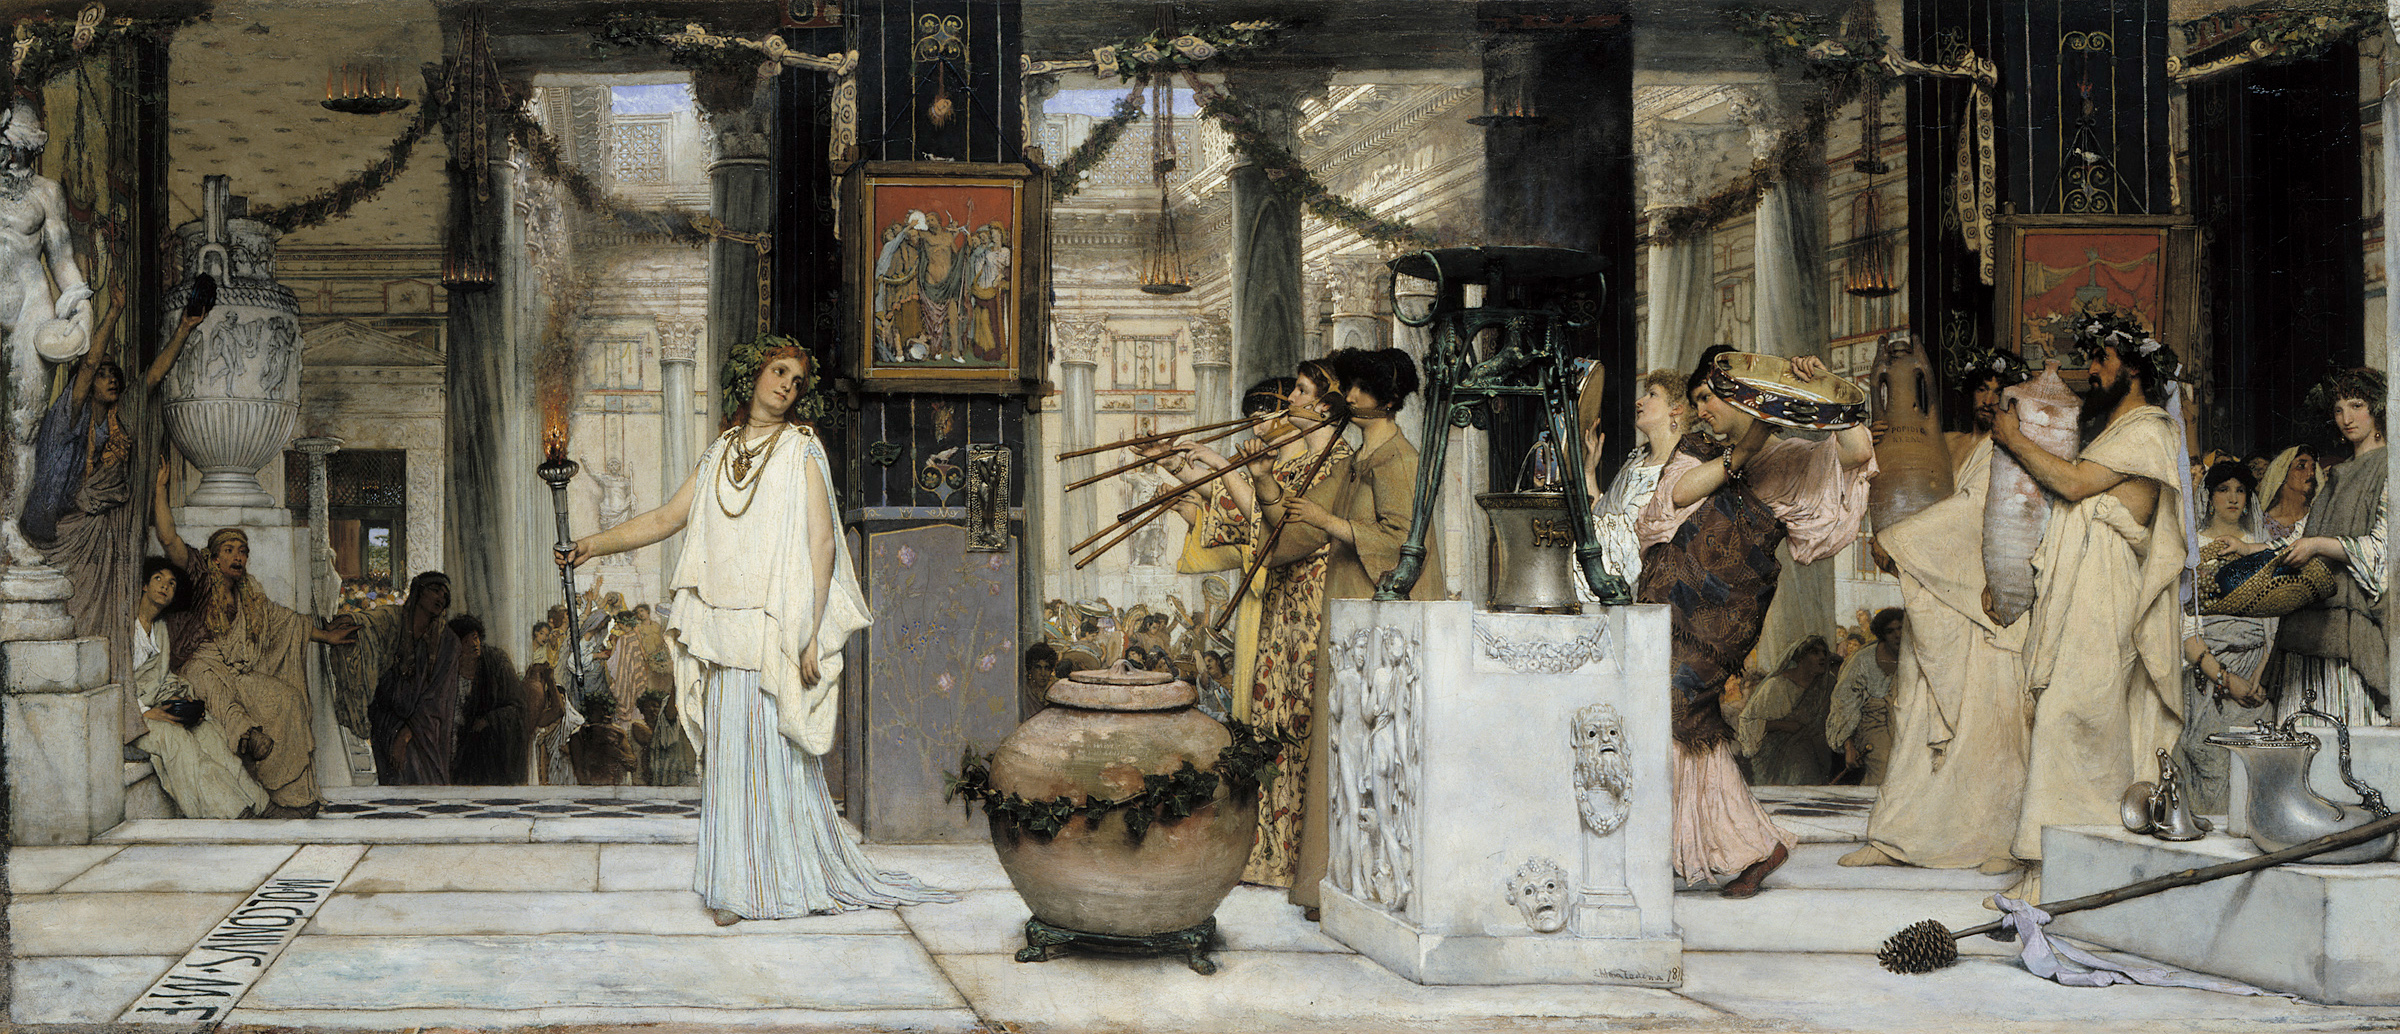 Lawrence Alm-Tadema: Das Fest der Weinlese, 1871.  © Hamburger Kunsthalle / bpk Foto: Elke Walford